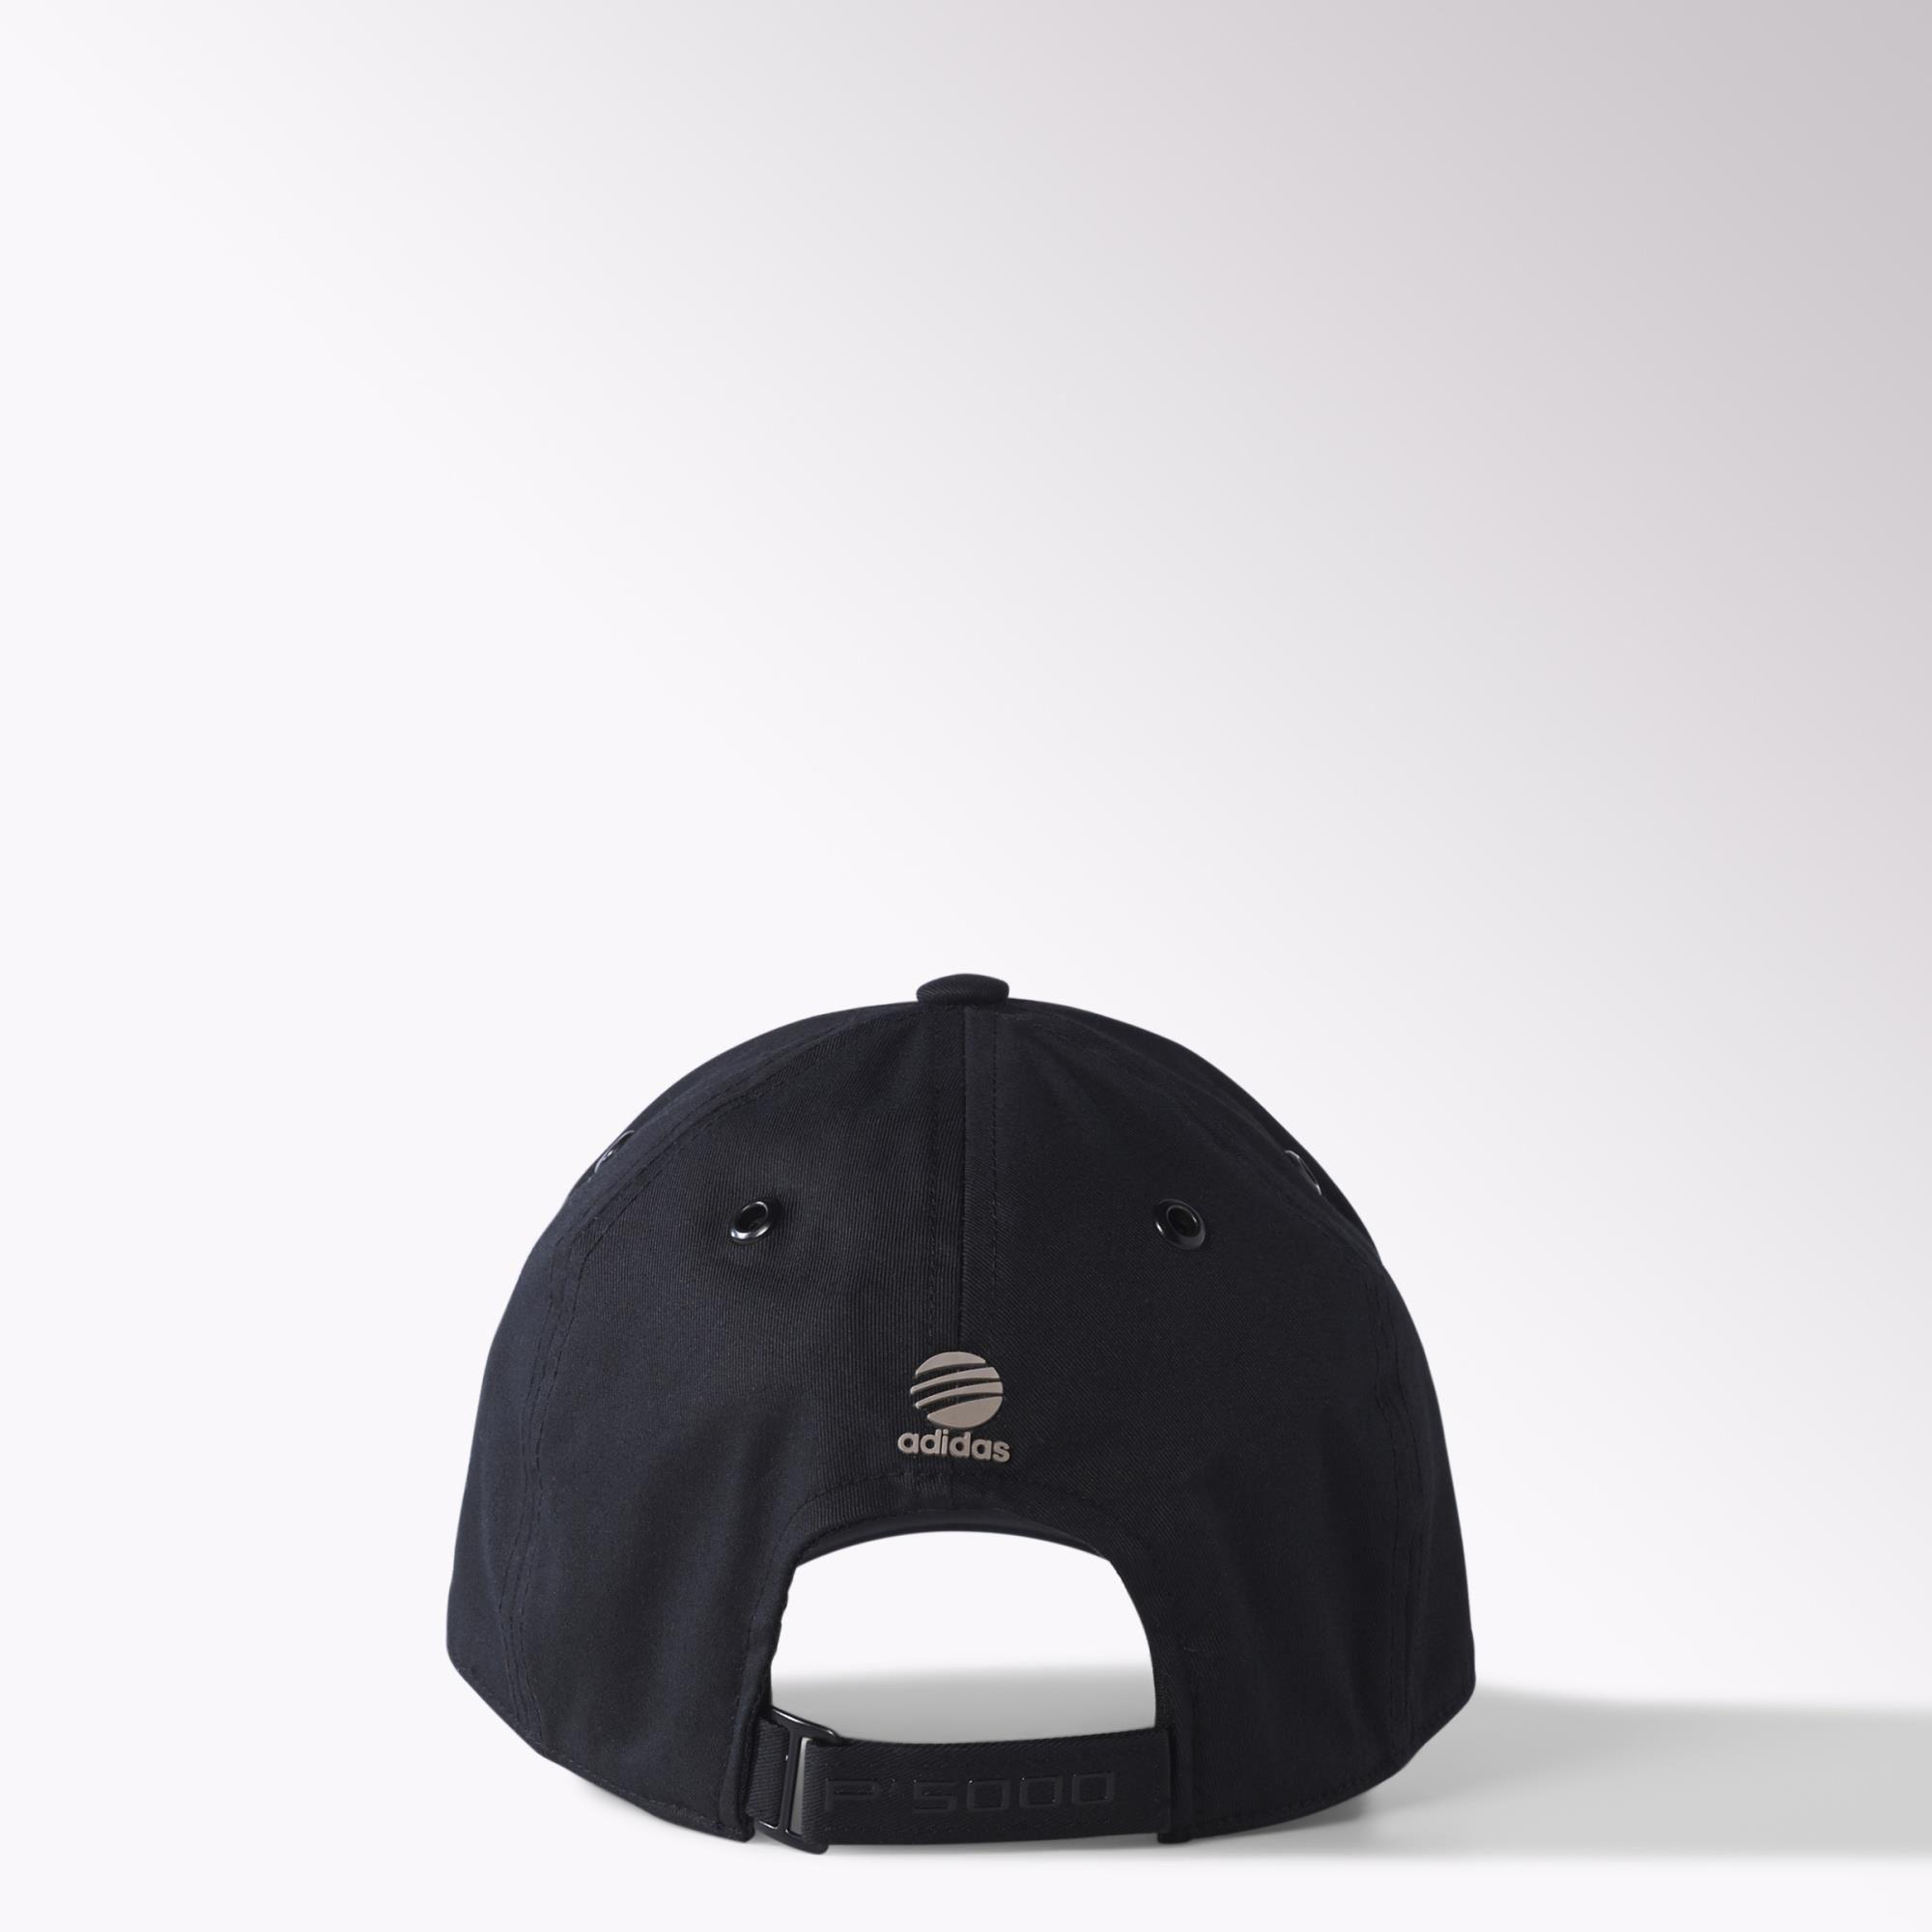 adidas Classic Cap II - Black | adidas Ireland